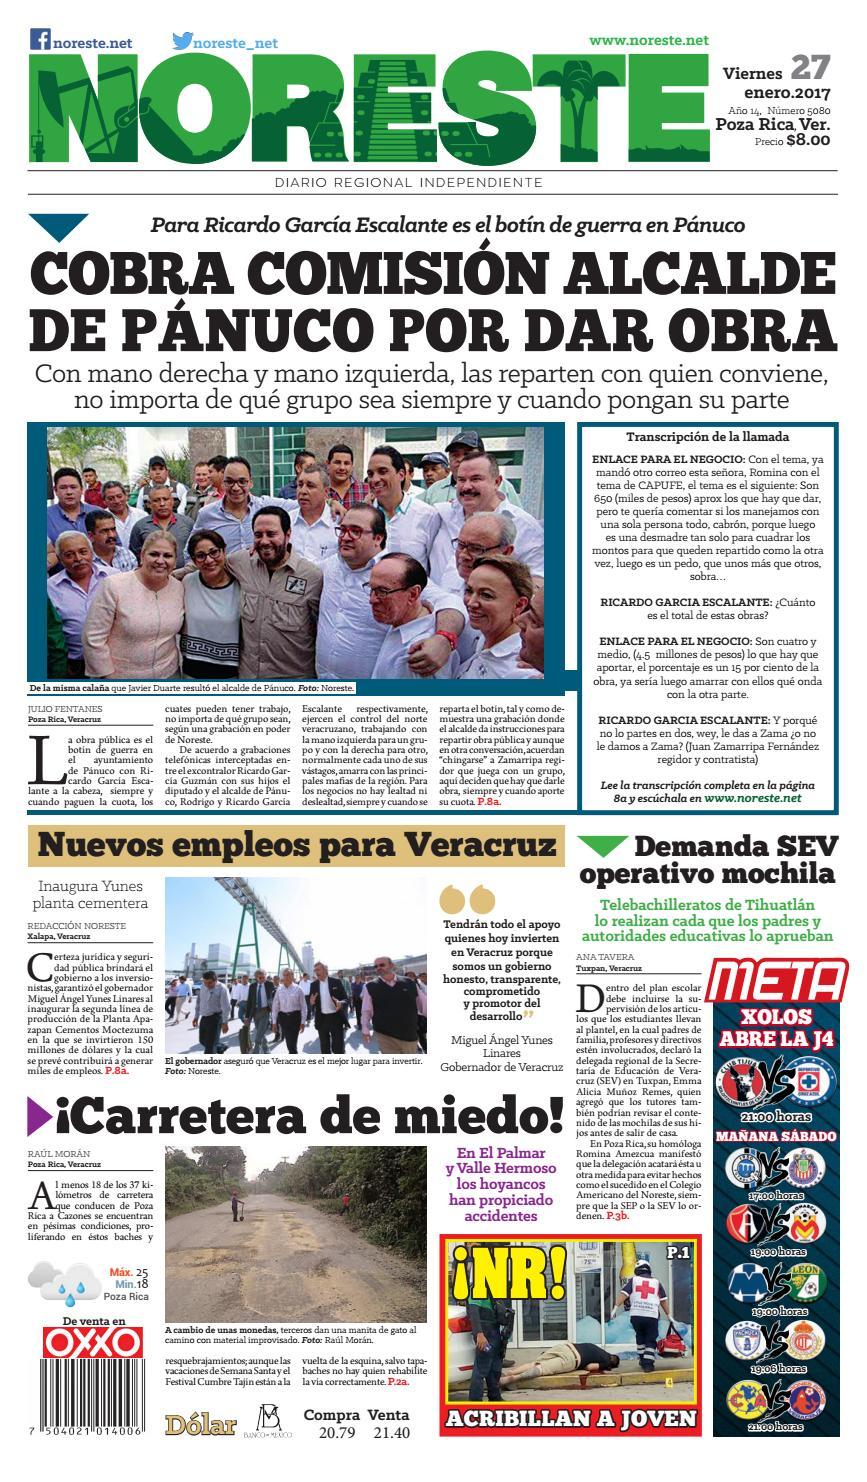 Cota Muebles Teziutlan - Versi N Impresa 27 De Enero De 2017 By Noreste Diario Regional [mjhdah]http://static.youblisher.com/publications/106/633856/large-1.jpg